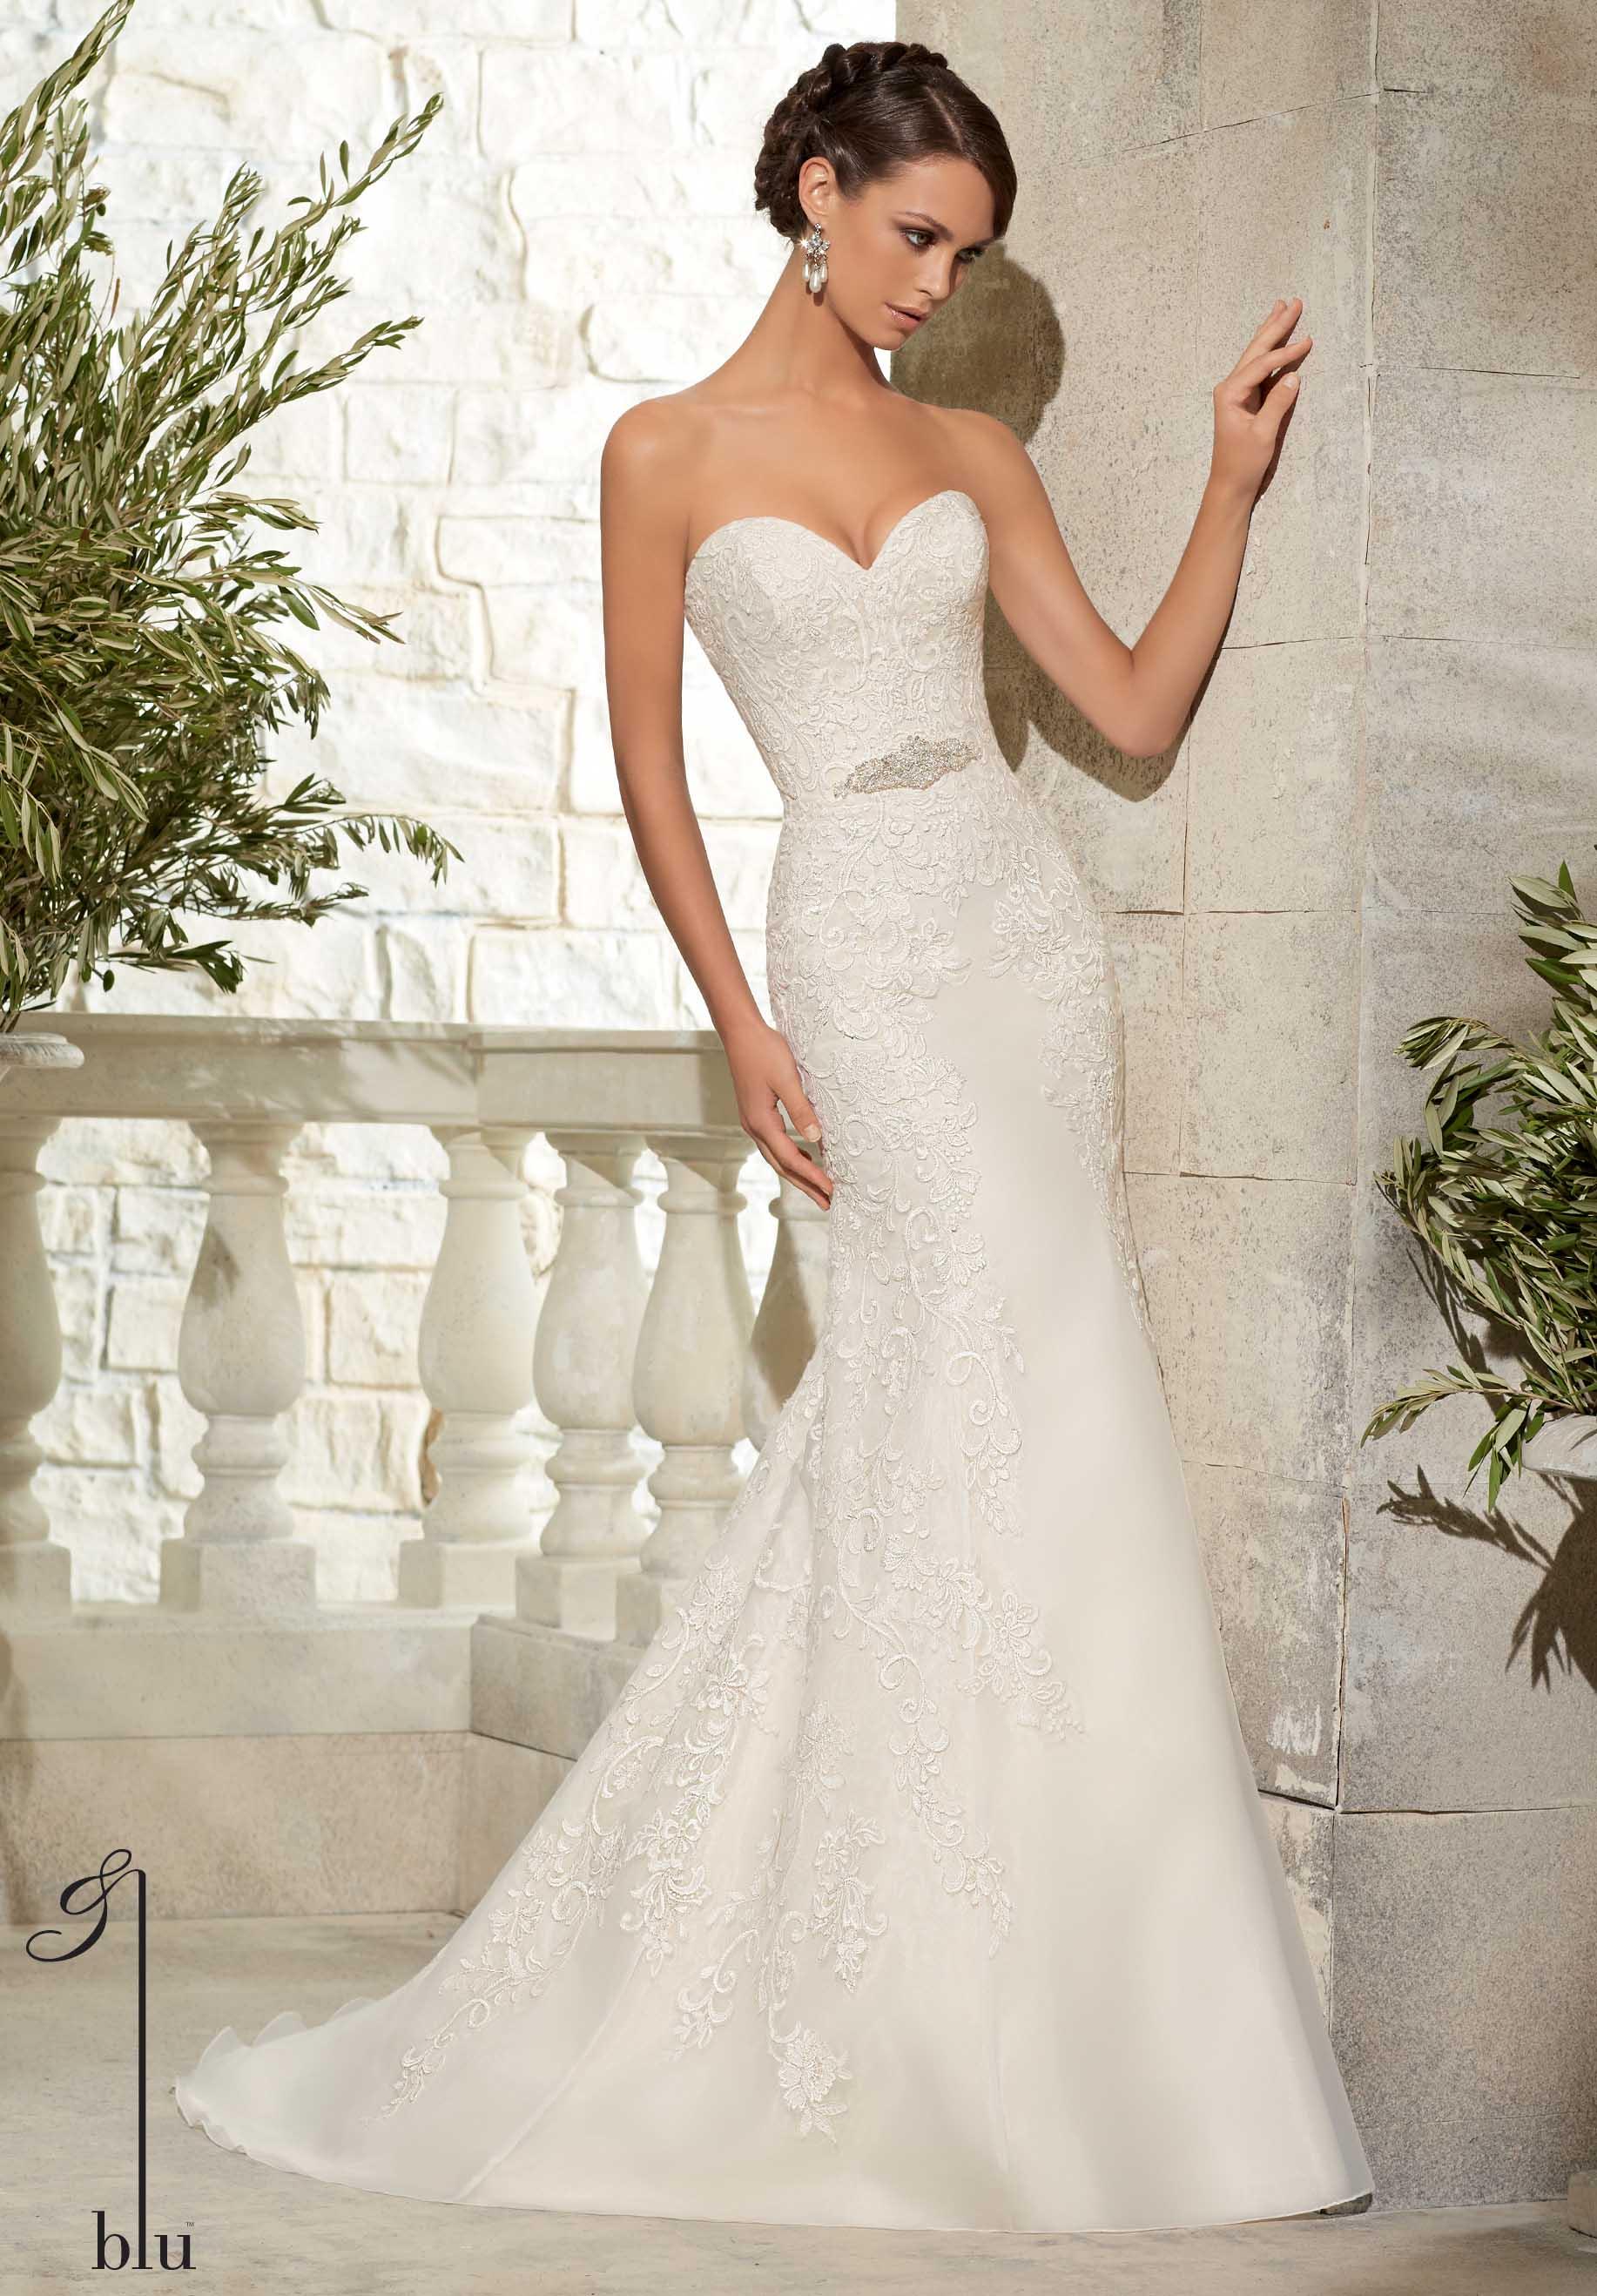 Sheridan – Brides by Design